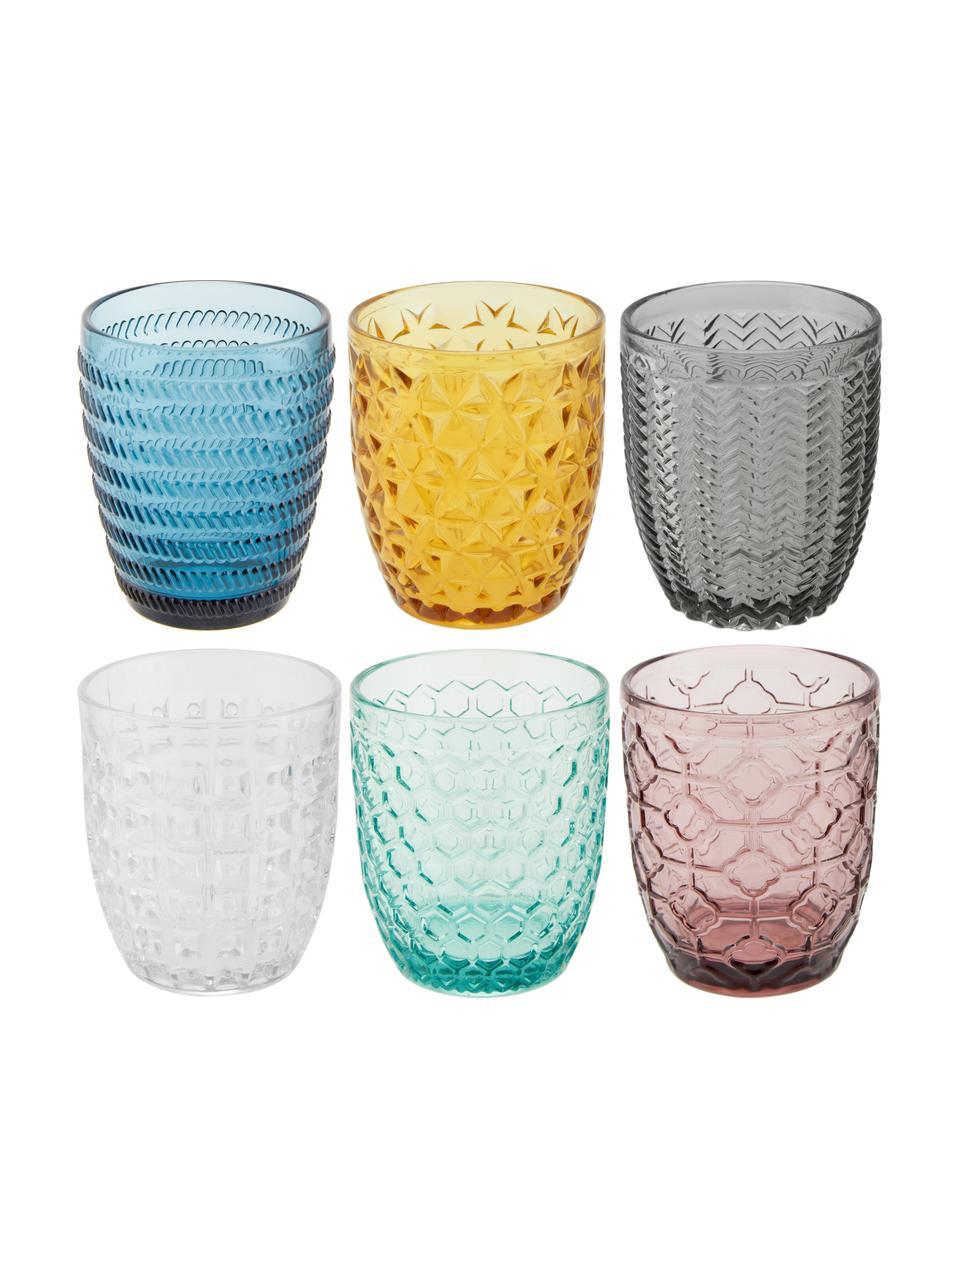 Wassergläser Geometrie in Bunt mit Strukturmuster, 6er-Set, Glas, Blau, Grün, Grau, Rosa, Goldgelb, Transparent, Ø 8 x H 10 cm